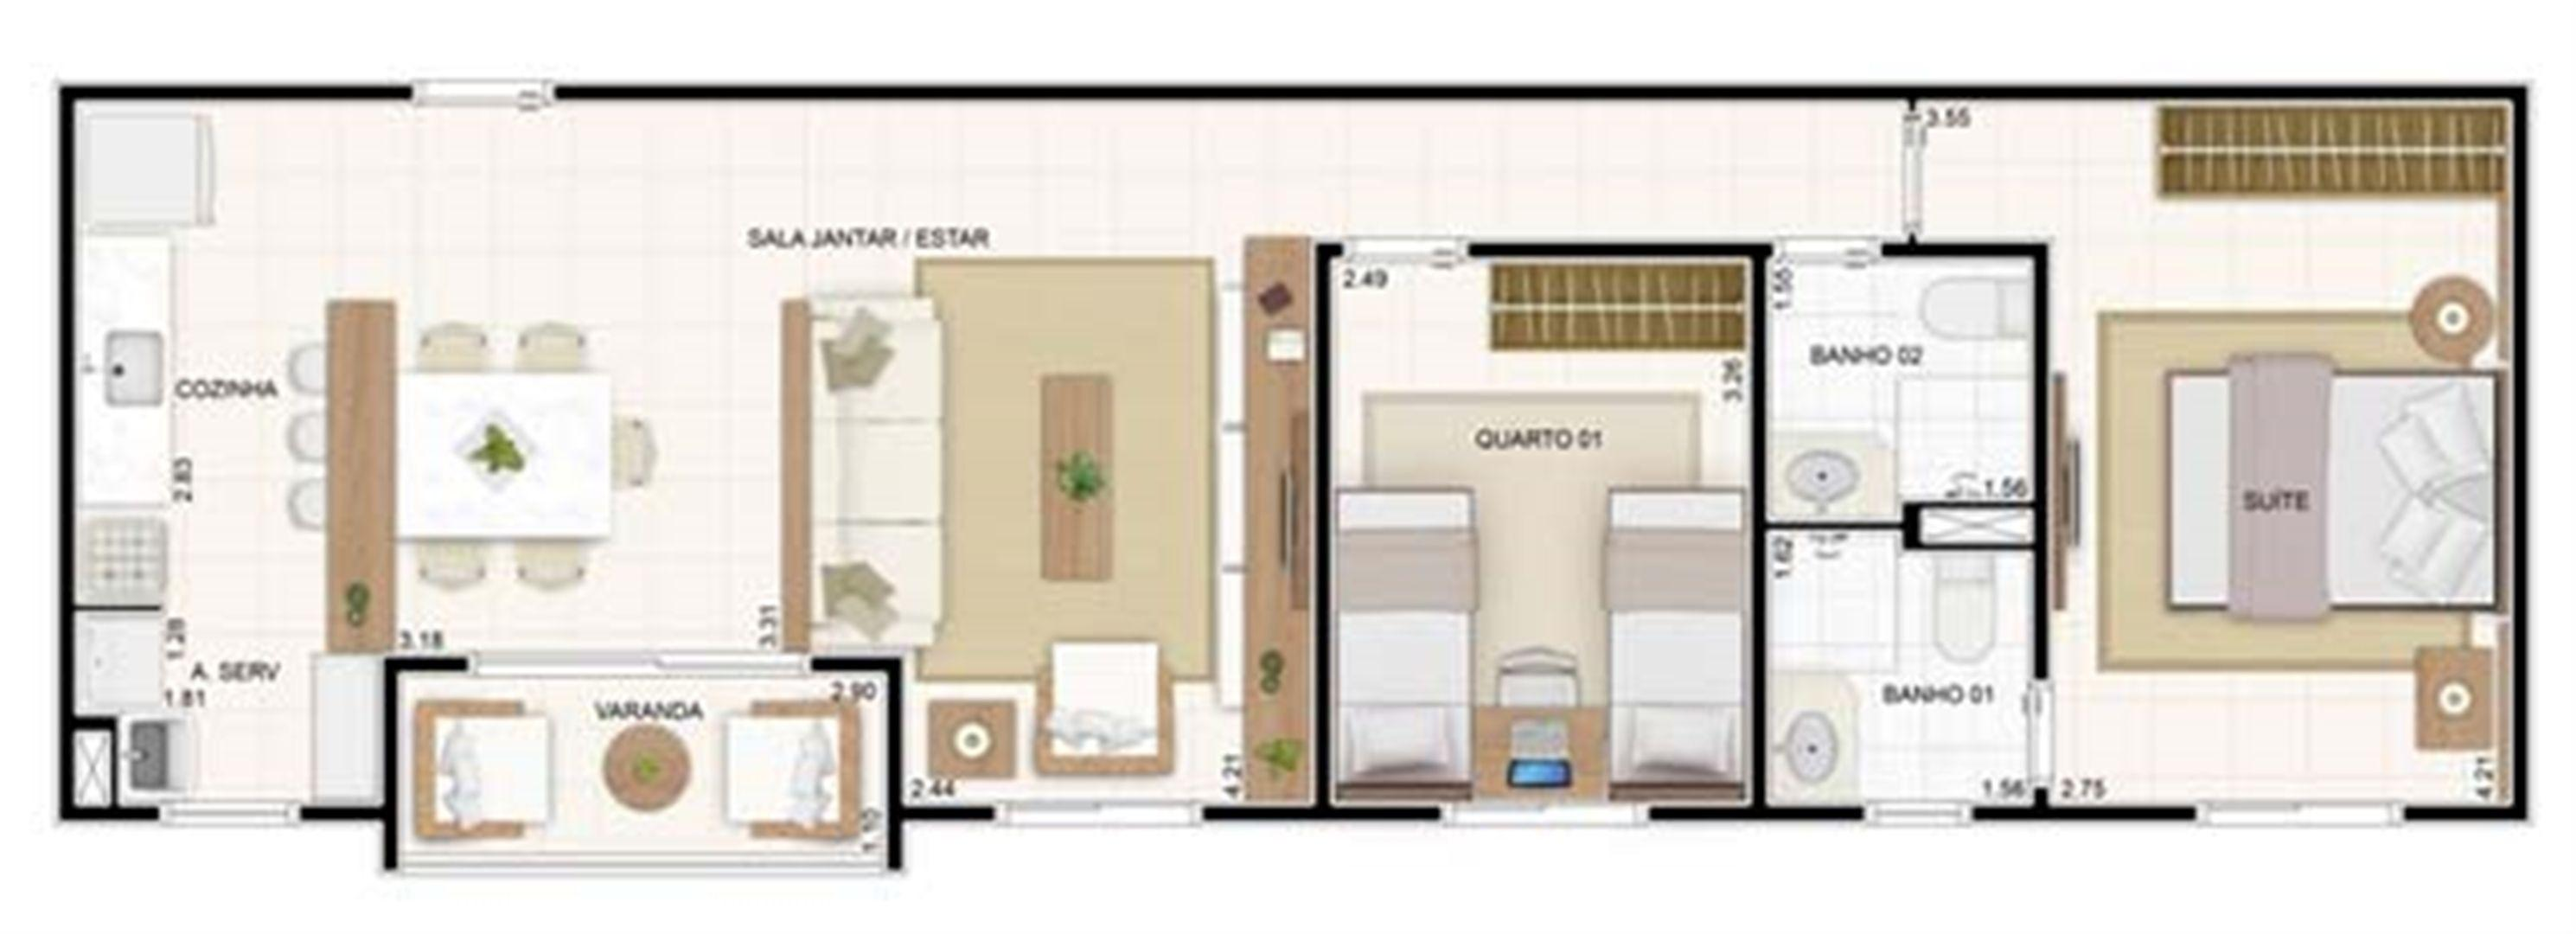 3 dorms Sala Ampliada 67,35m² | Vita 2 Residencial Clube – Apartamento no  Pitimbu - Natal - Rio Grande do Norte